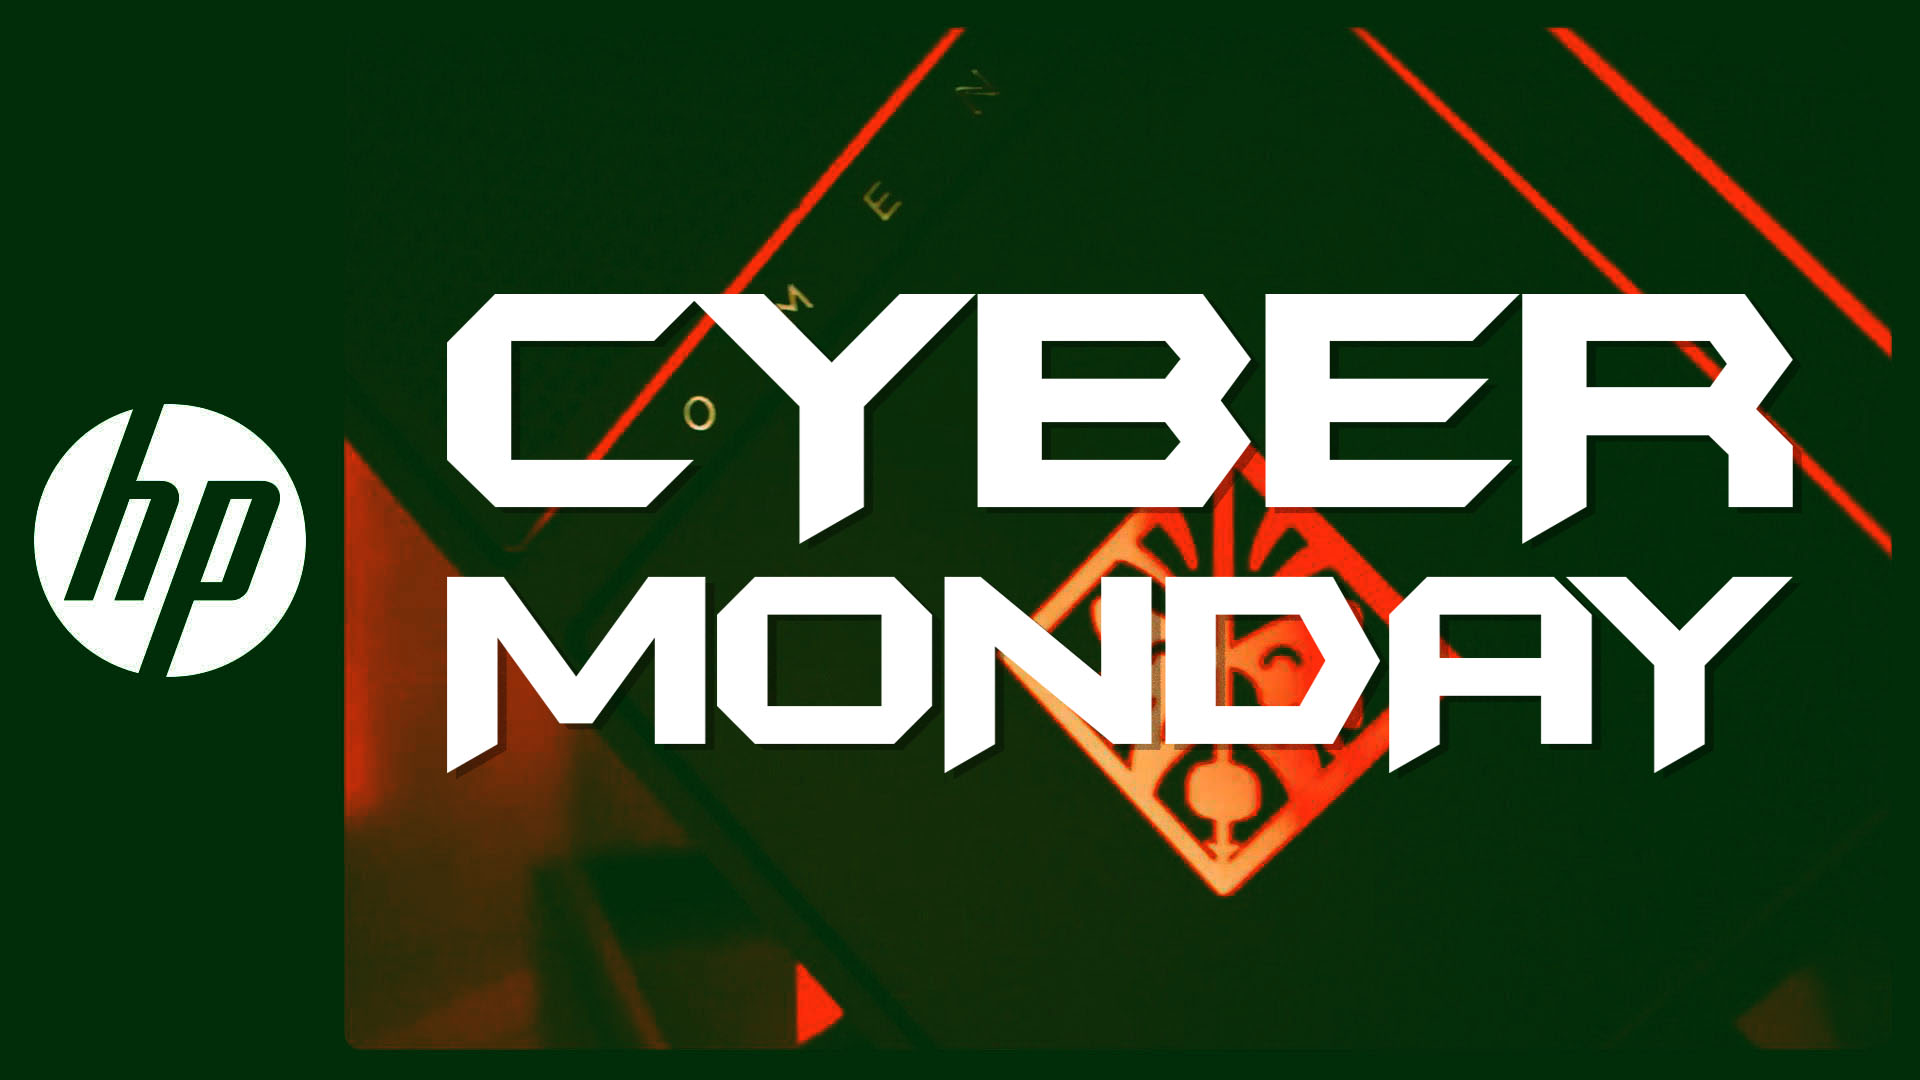 cyber monday - photo #14